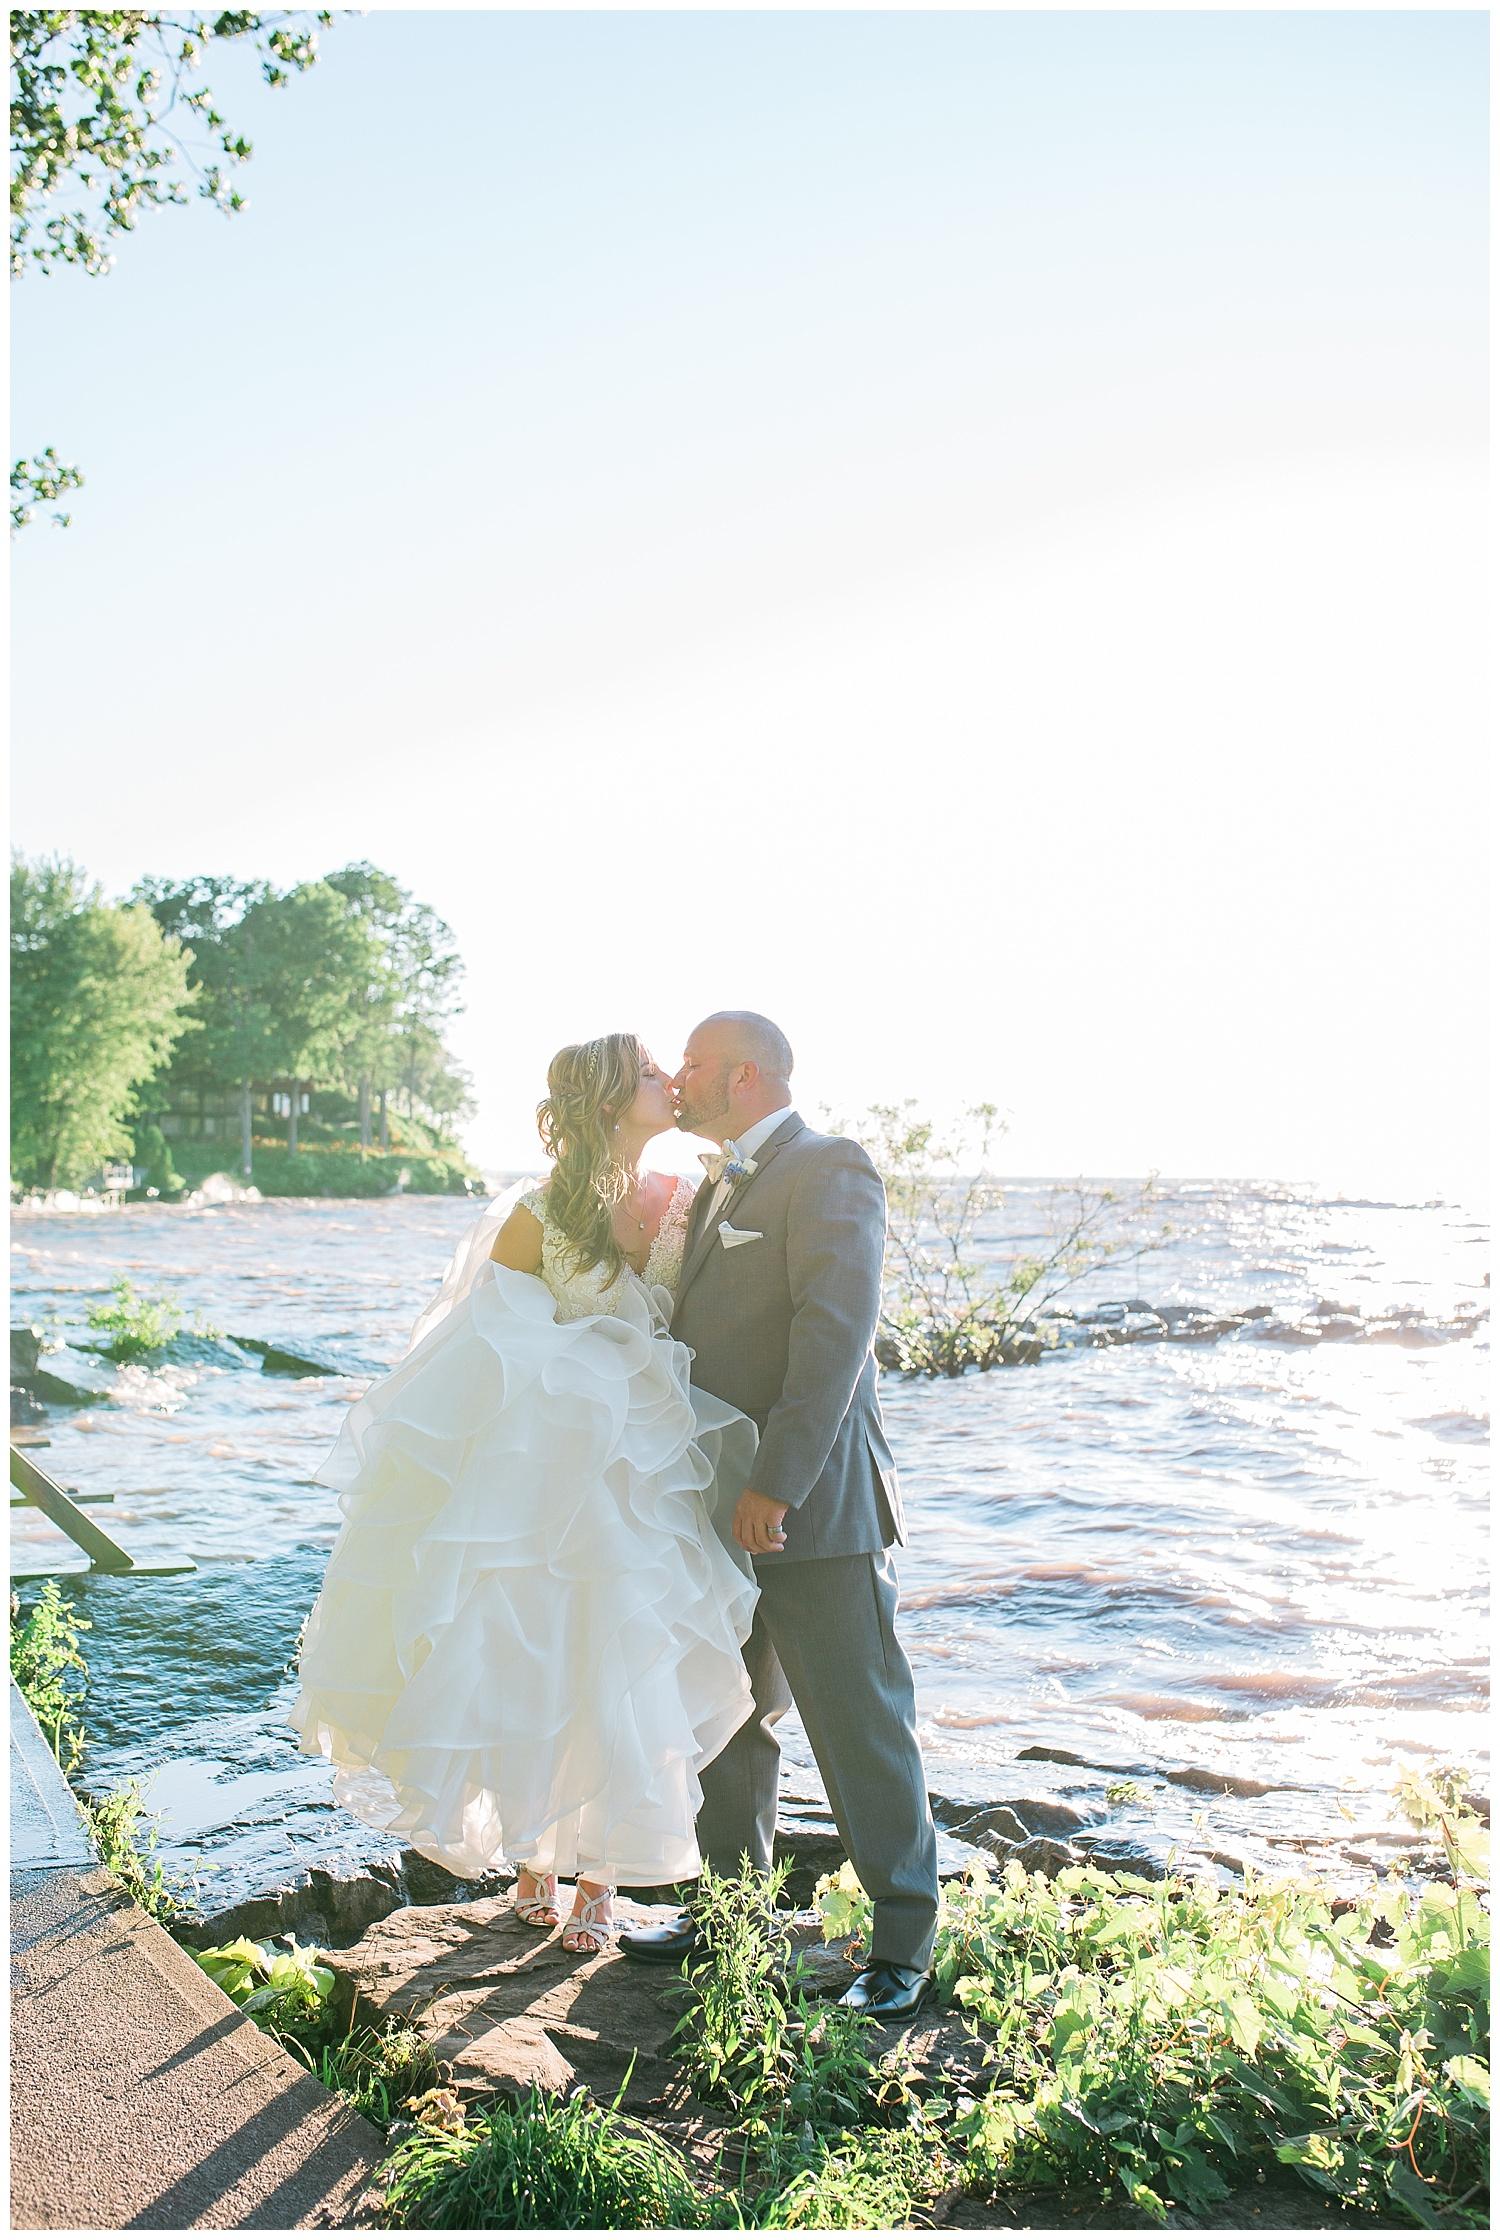 Sean and Andrea - Webster wedding - lass and beau-1244_Buffalo wedding photography.jpg